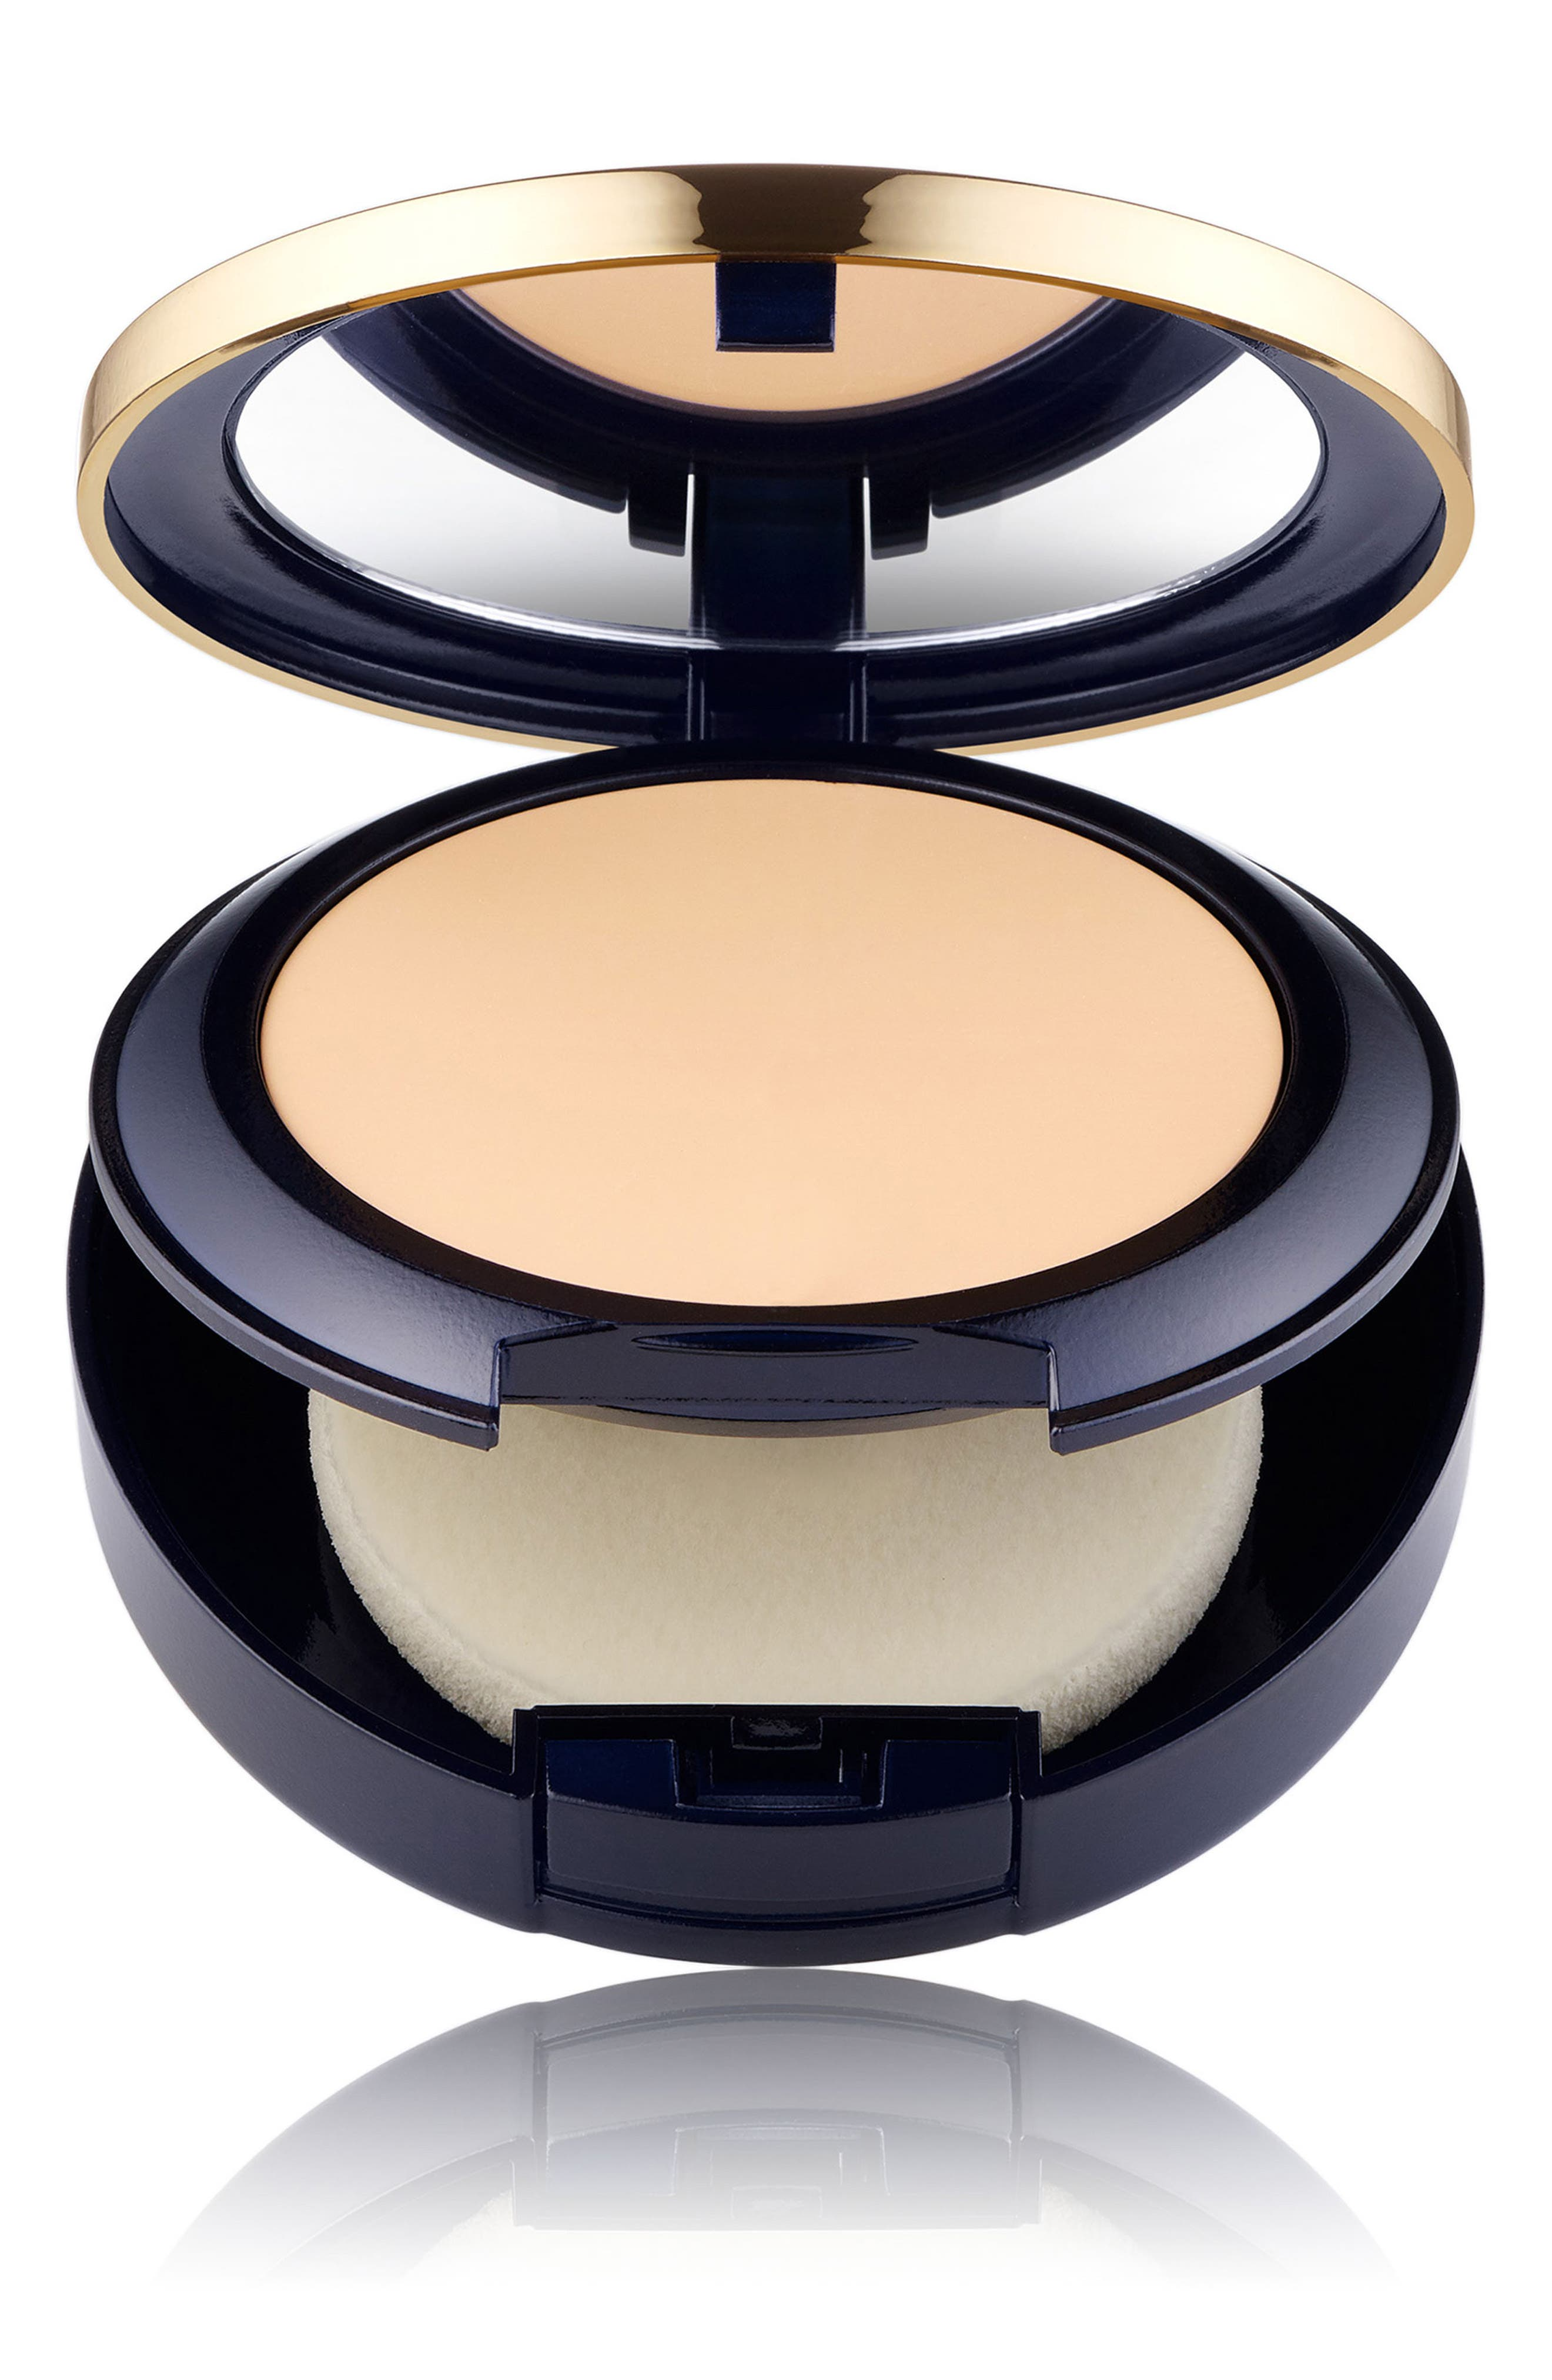 Estee Lauder Double Wear Stay In Place Matte Powder Foundation - 1 Dawn